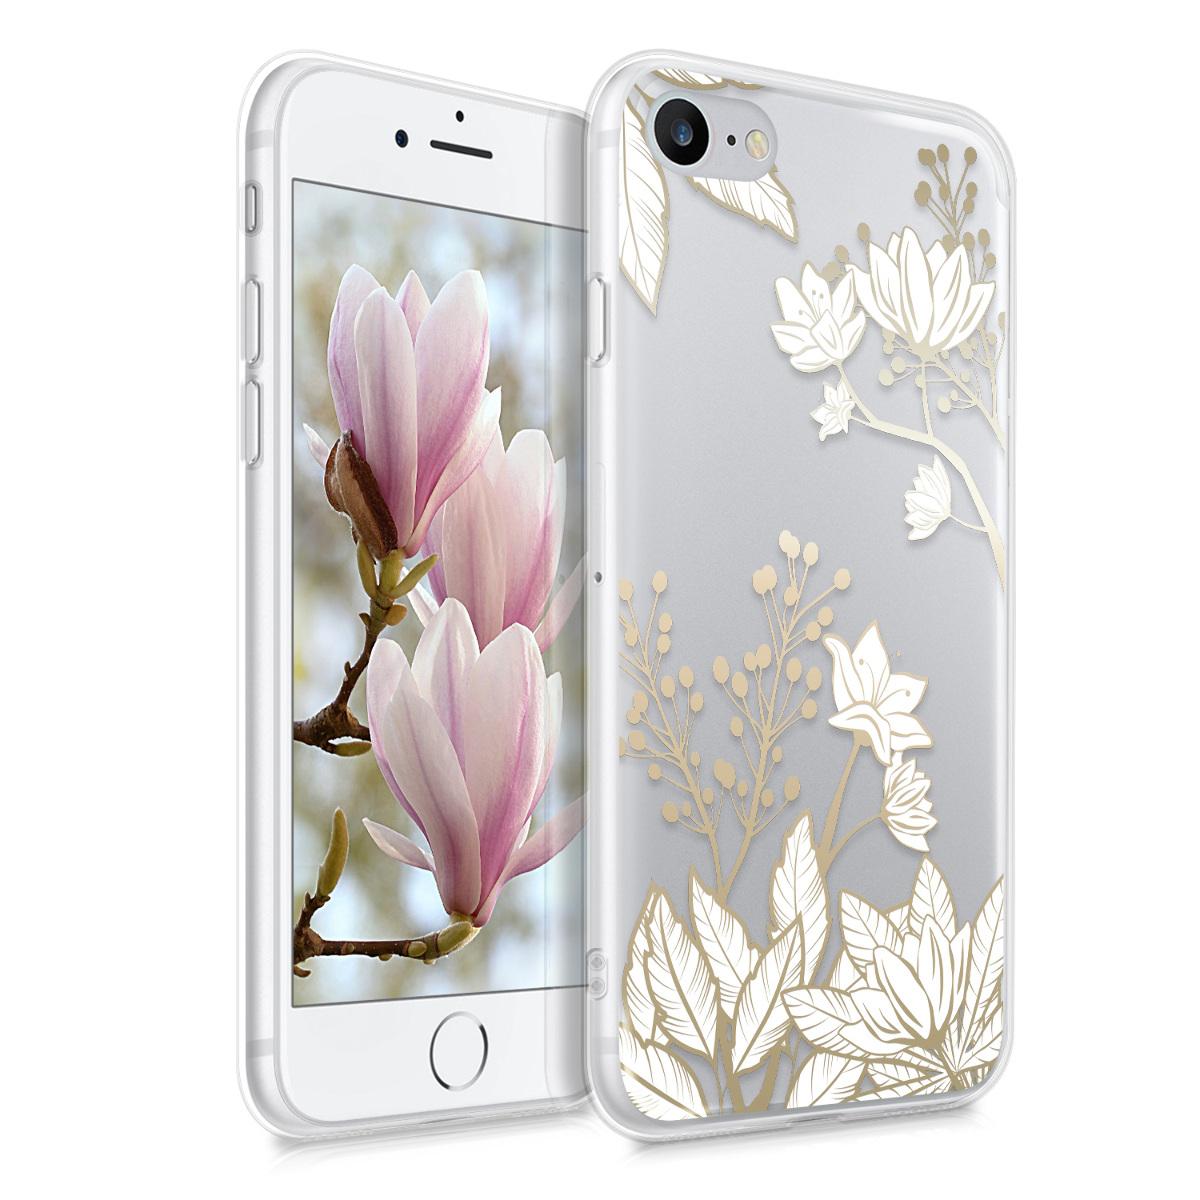 Kvalitní silikonové TPU pouzdro pro Apple iPhone 7 / 8 / SE  - Floral Leaf Mix Gold | White | Transparent